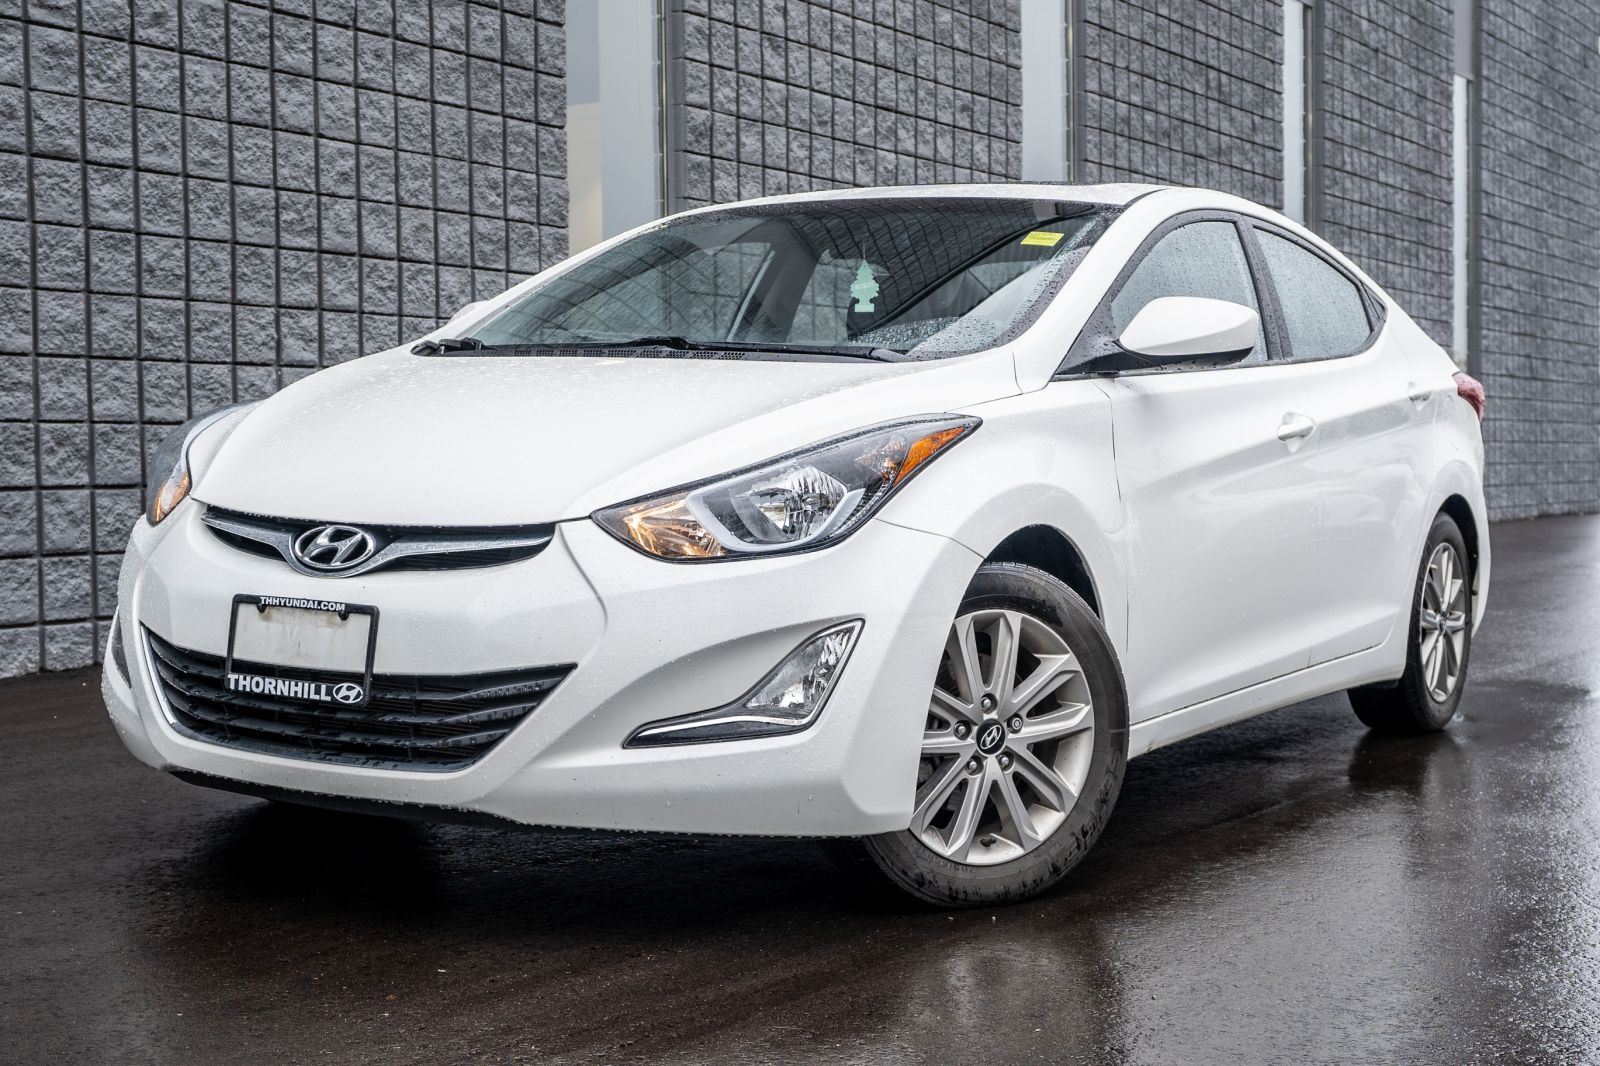 2014 Hyundai Elantra GLS